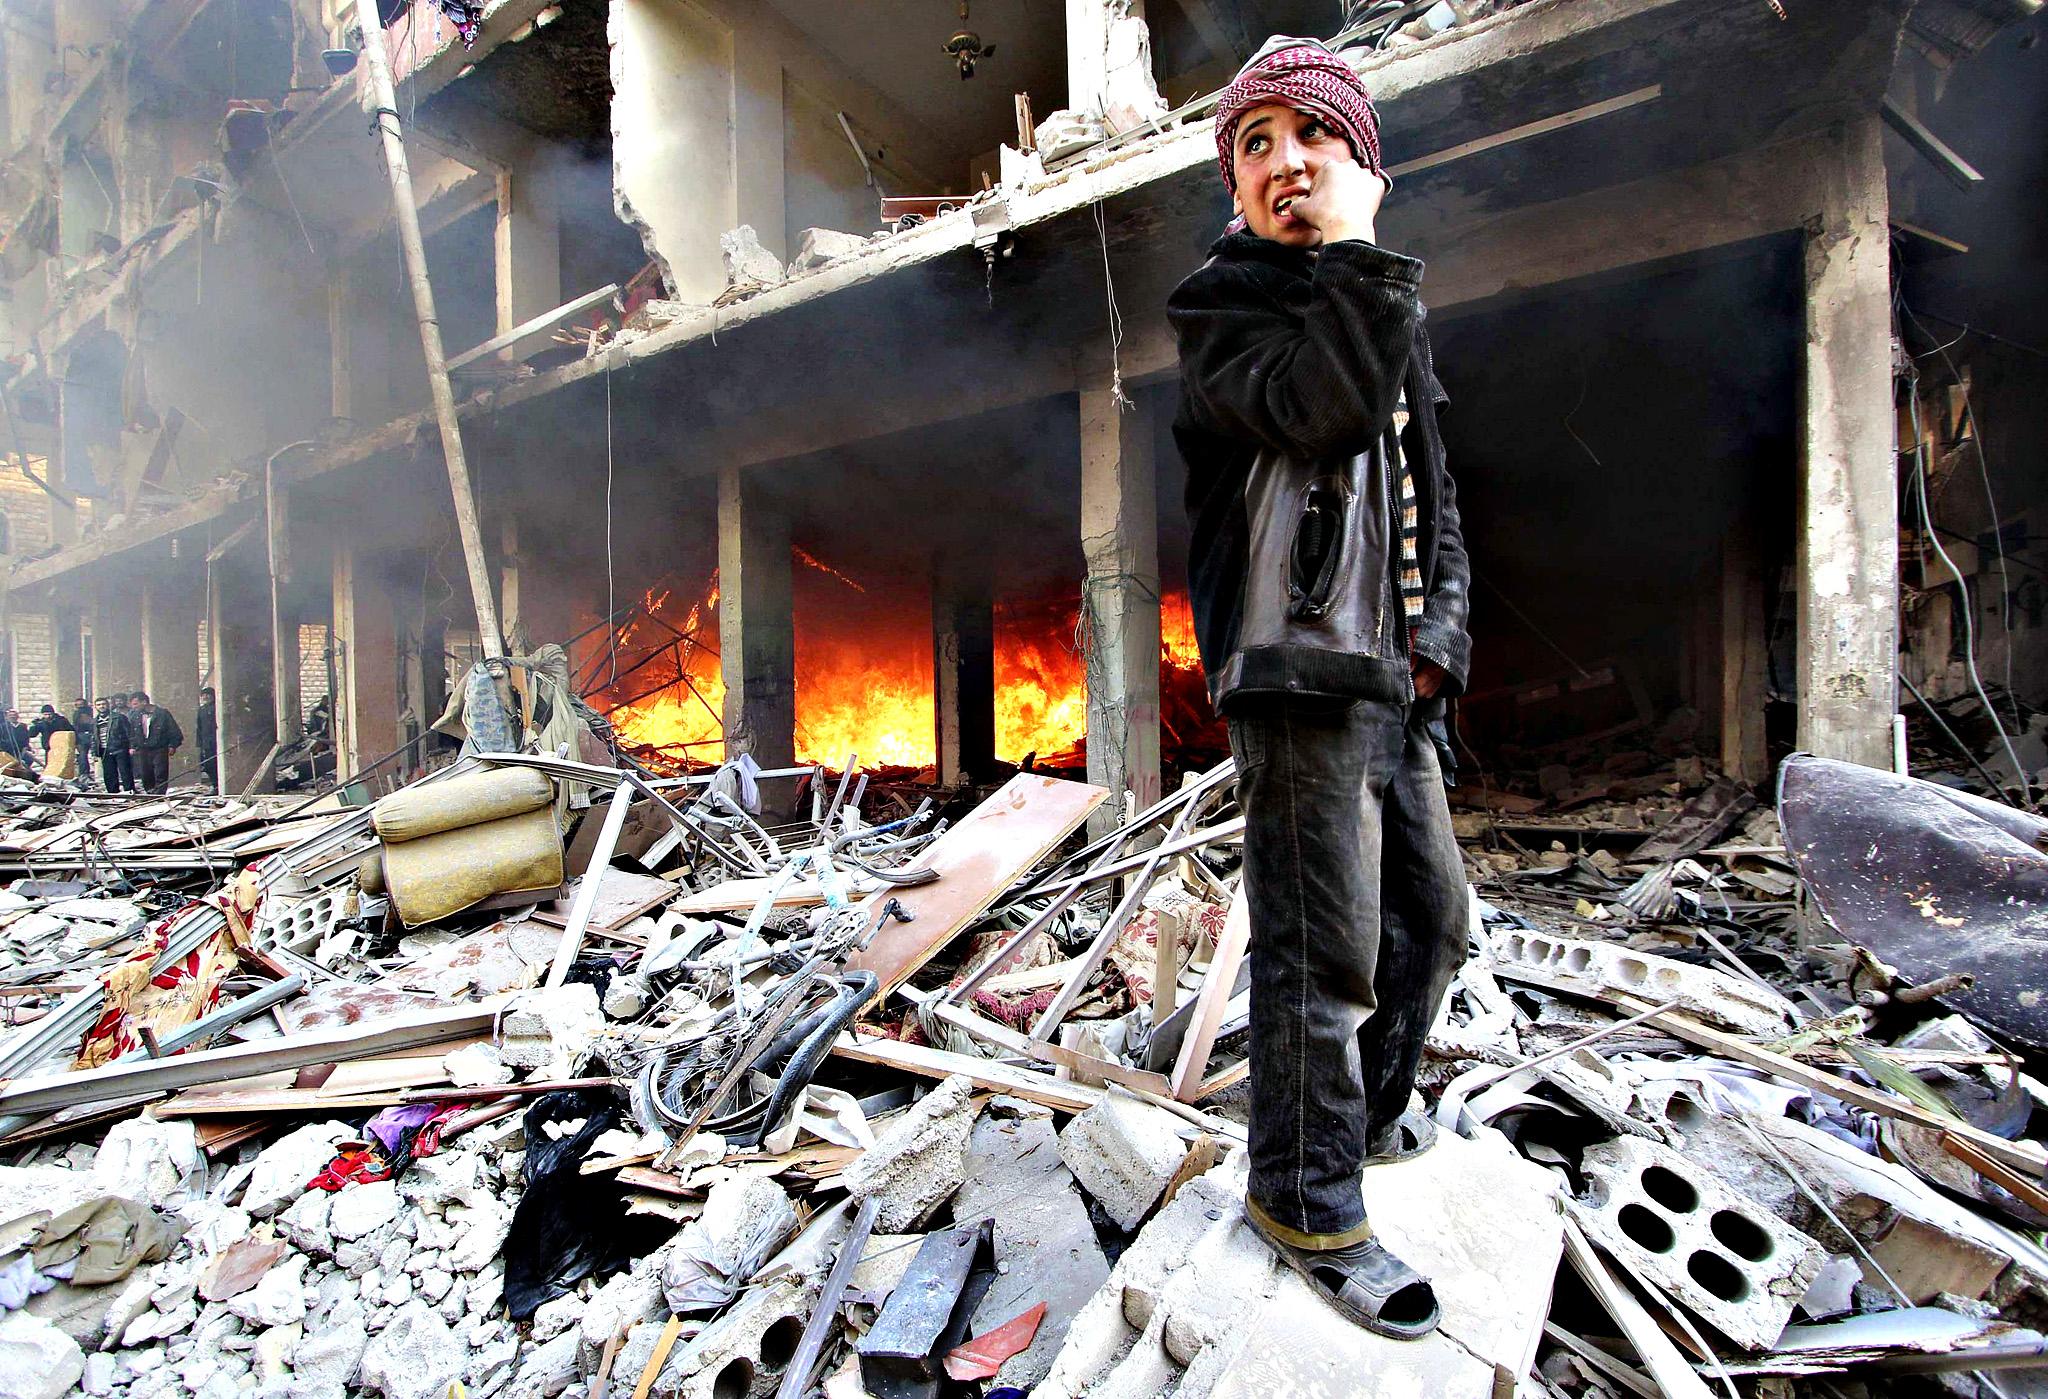 ohammed Badra/Reuters